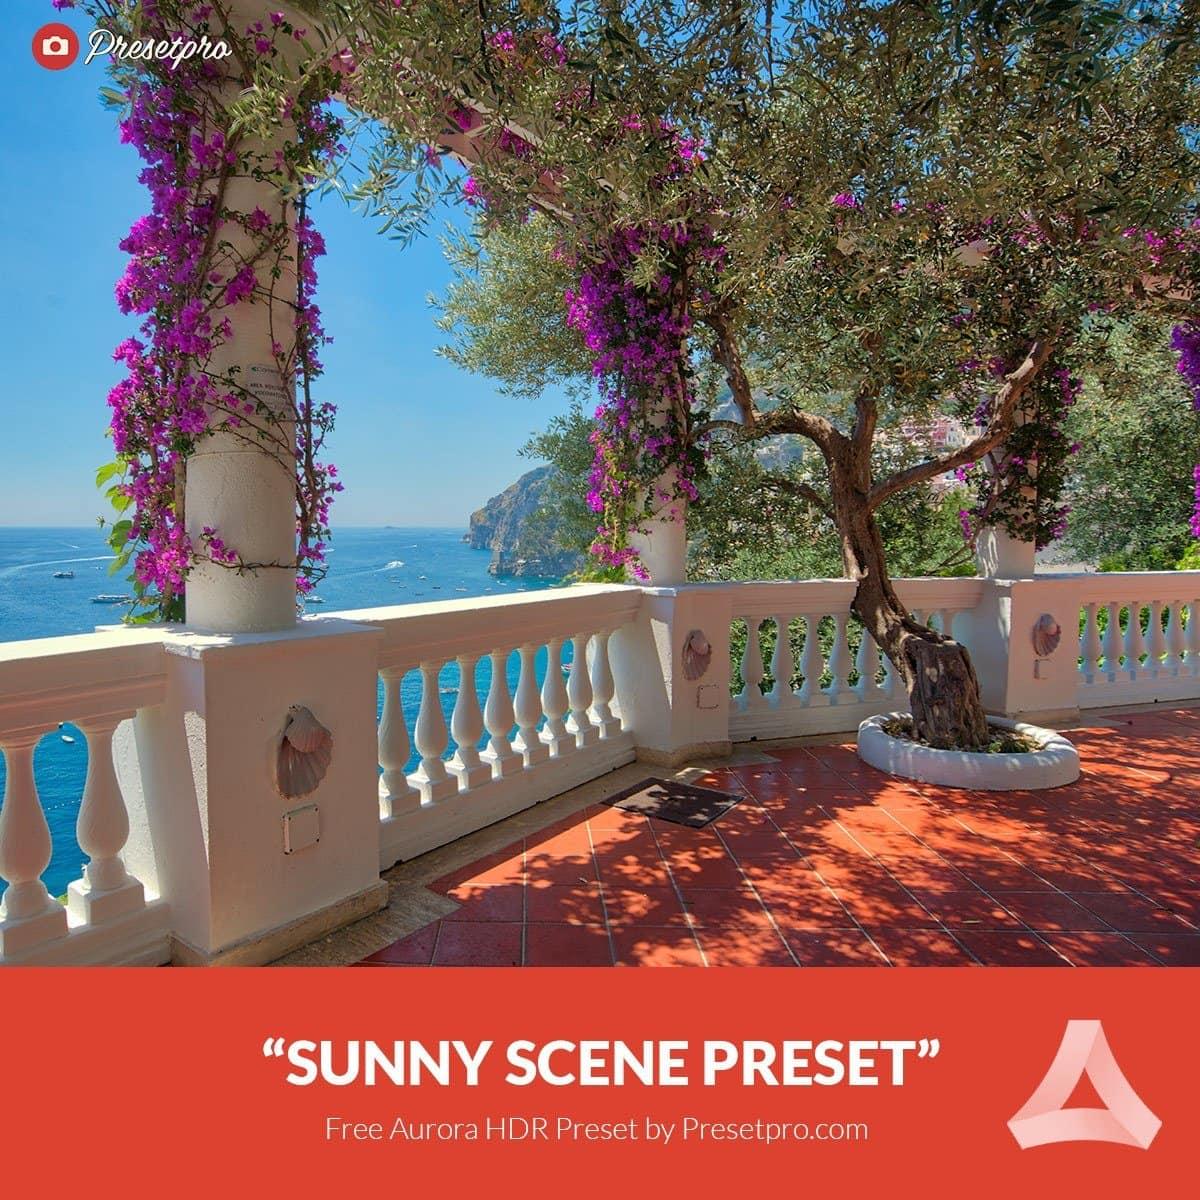 Free-Aurora-HDR-Sunny-Scene Presetpro